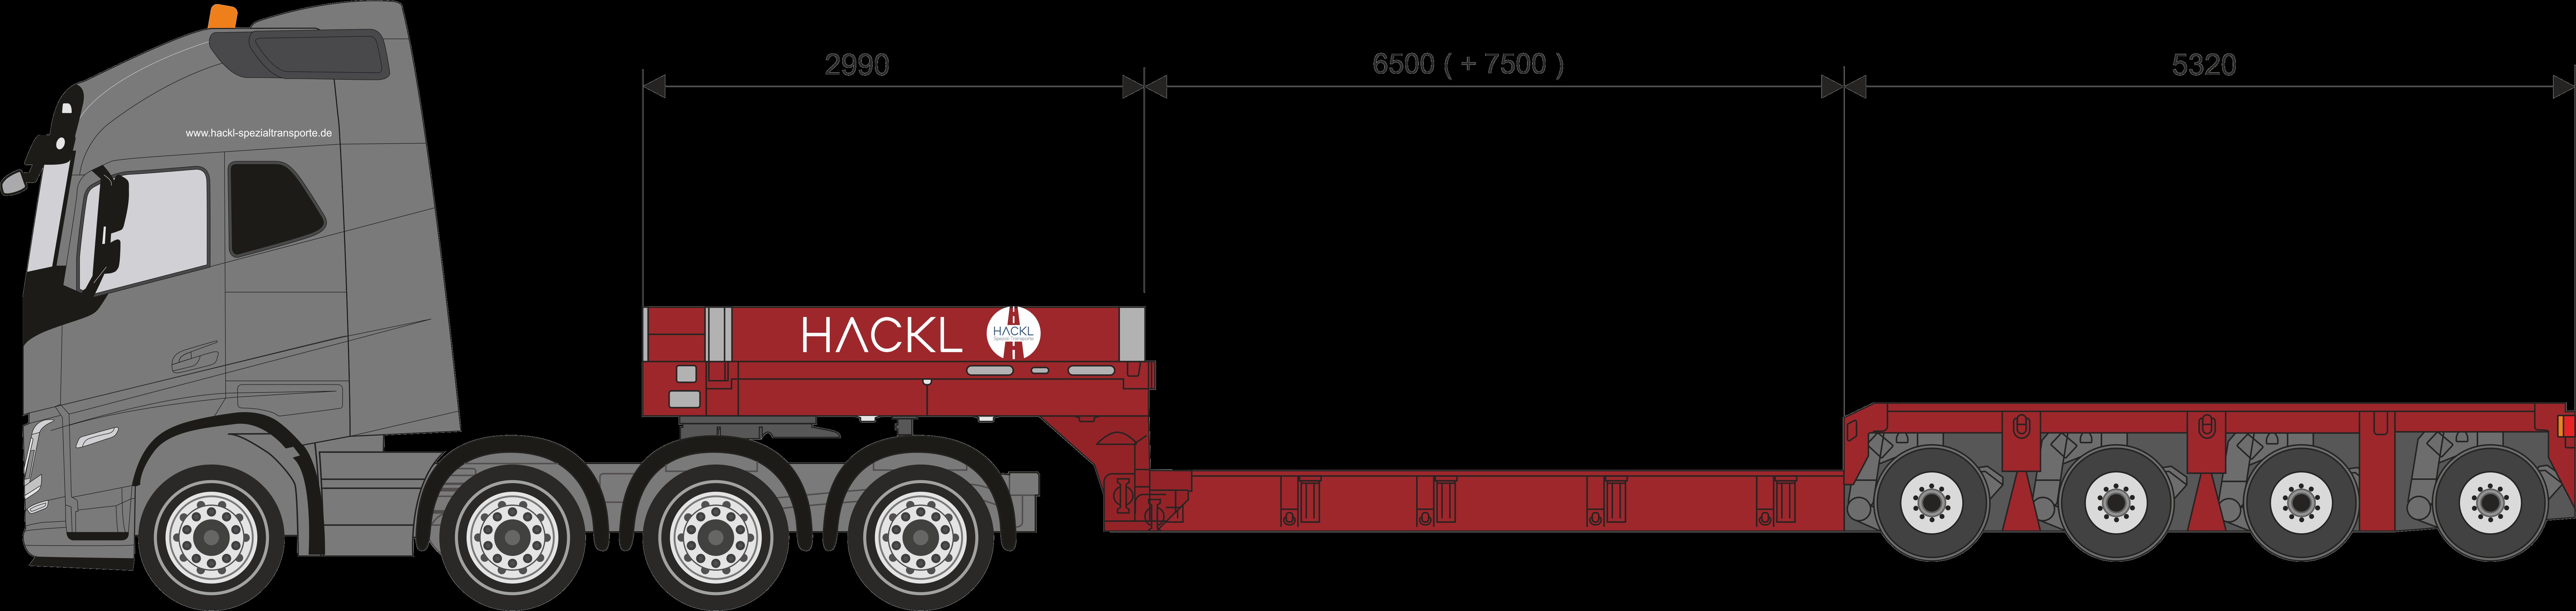 Hackl-Spezialtransporte300